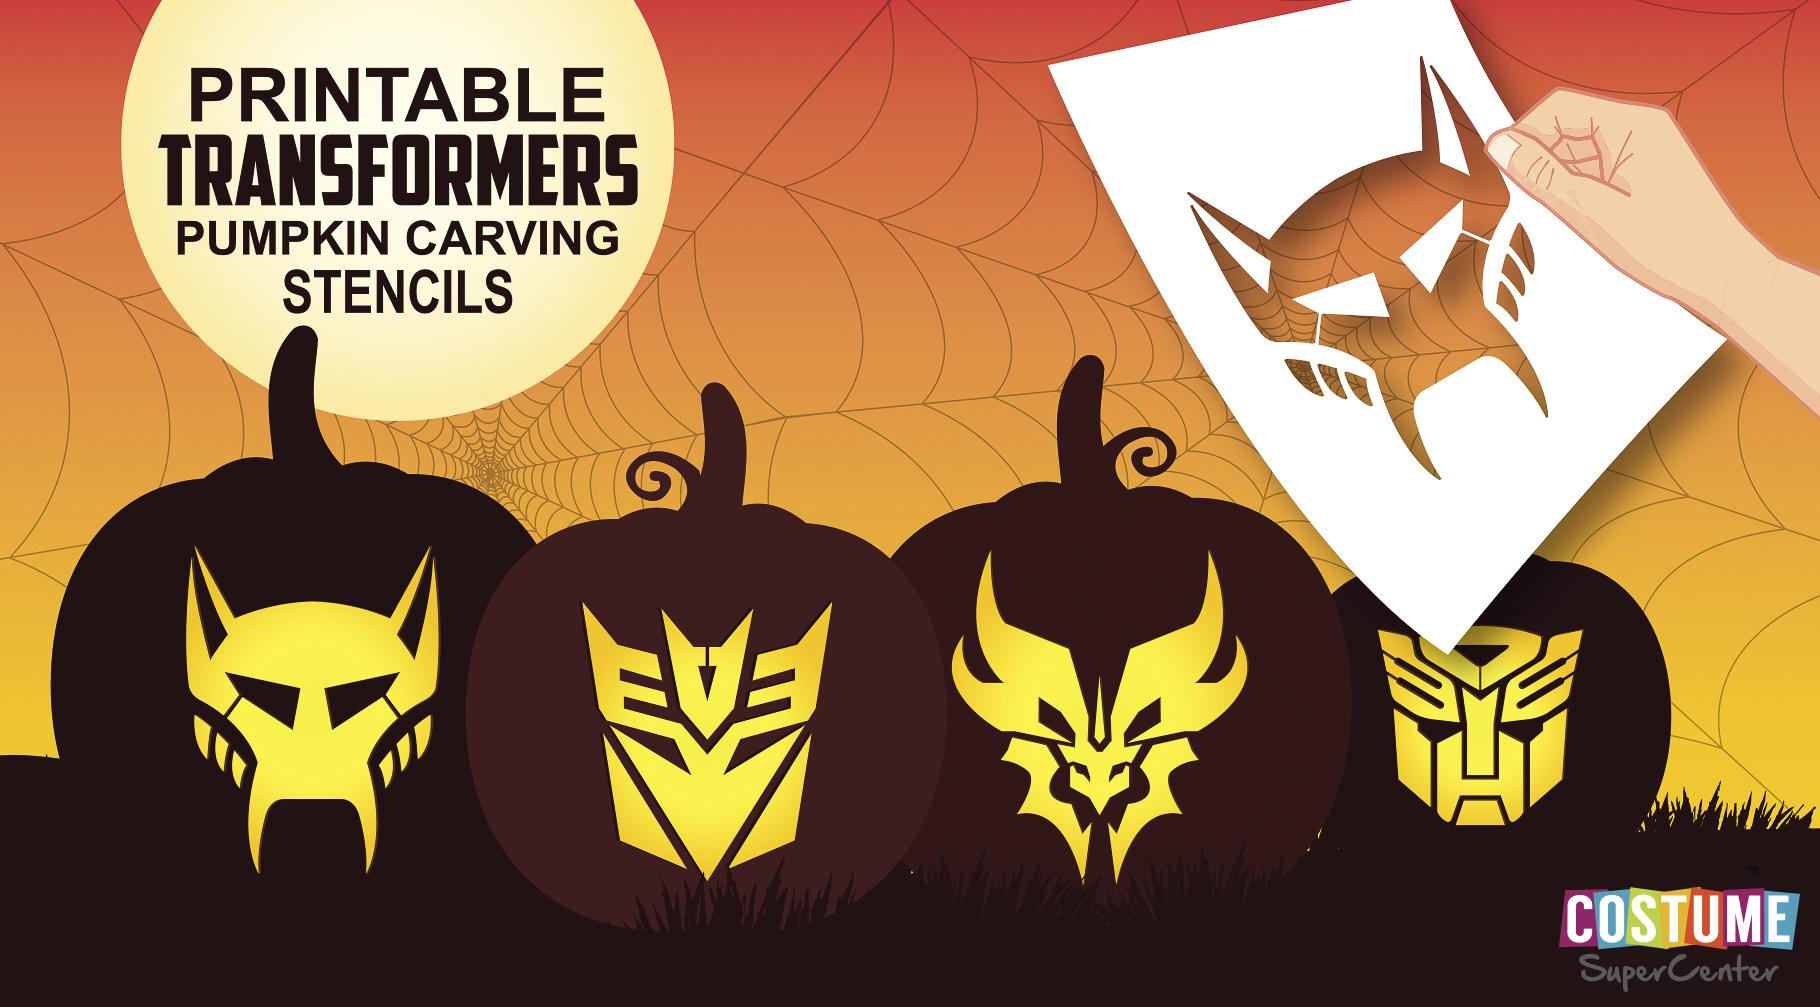 Free Transformer Pumpkin Carving Stencils   Costume Supercenter Blog - Free Printable Pumpkin Carving Stencils